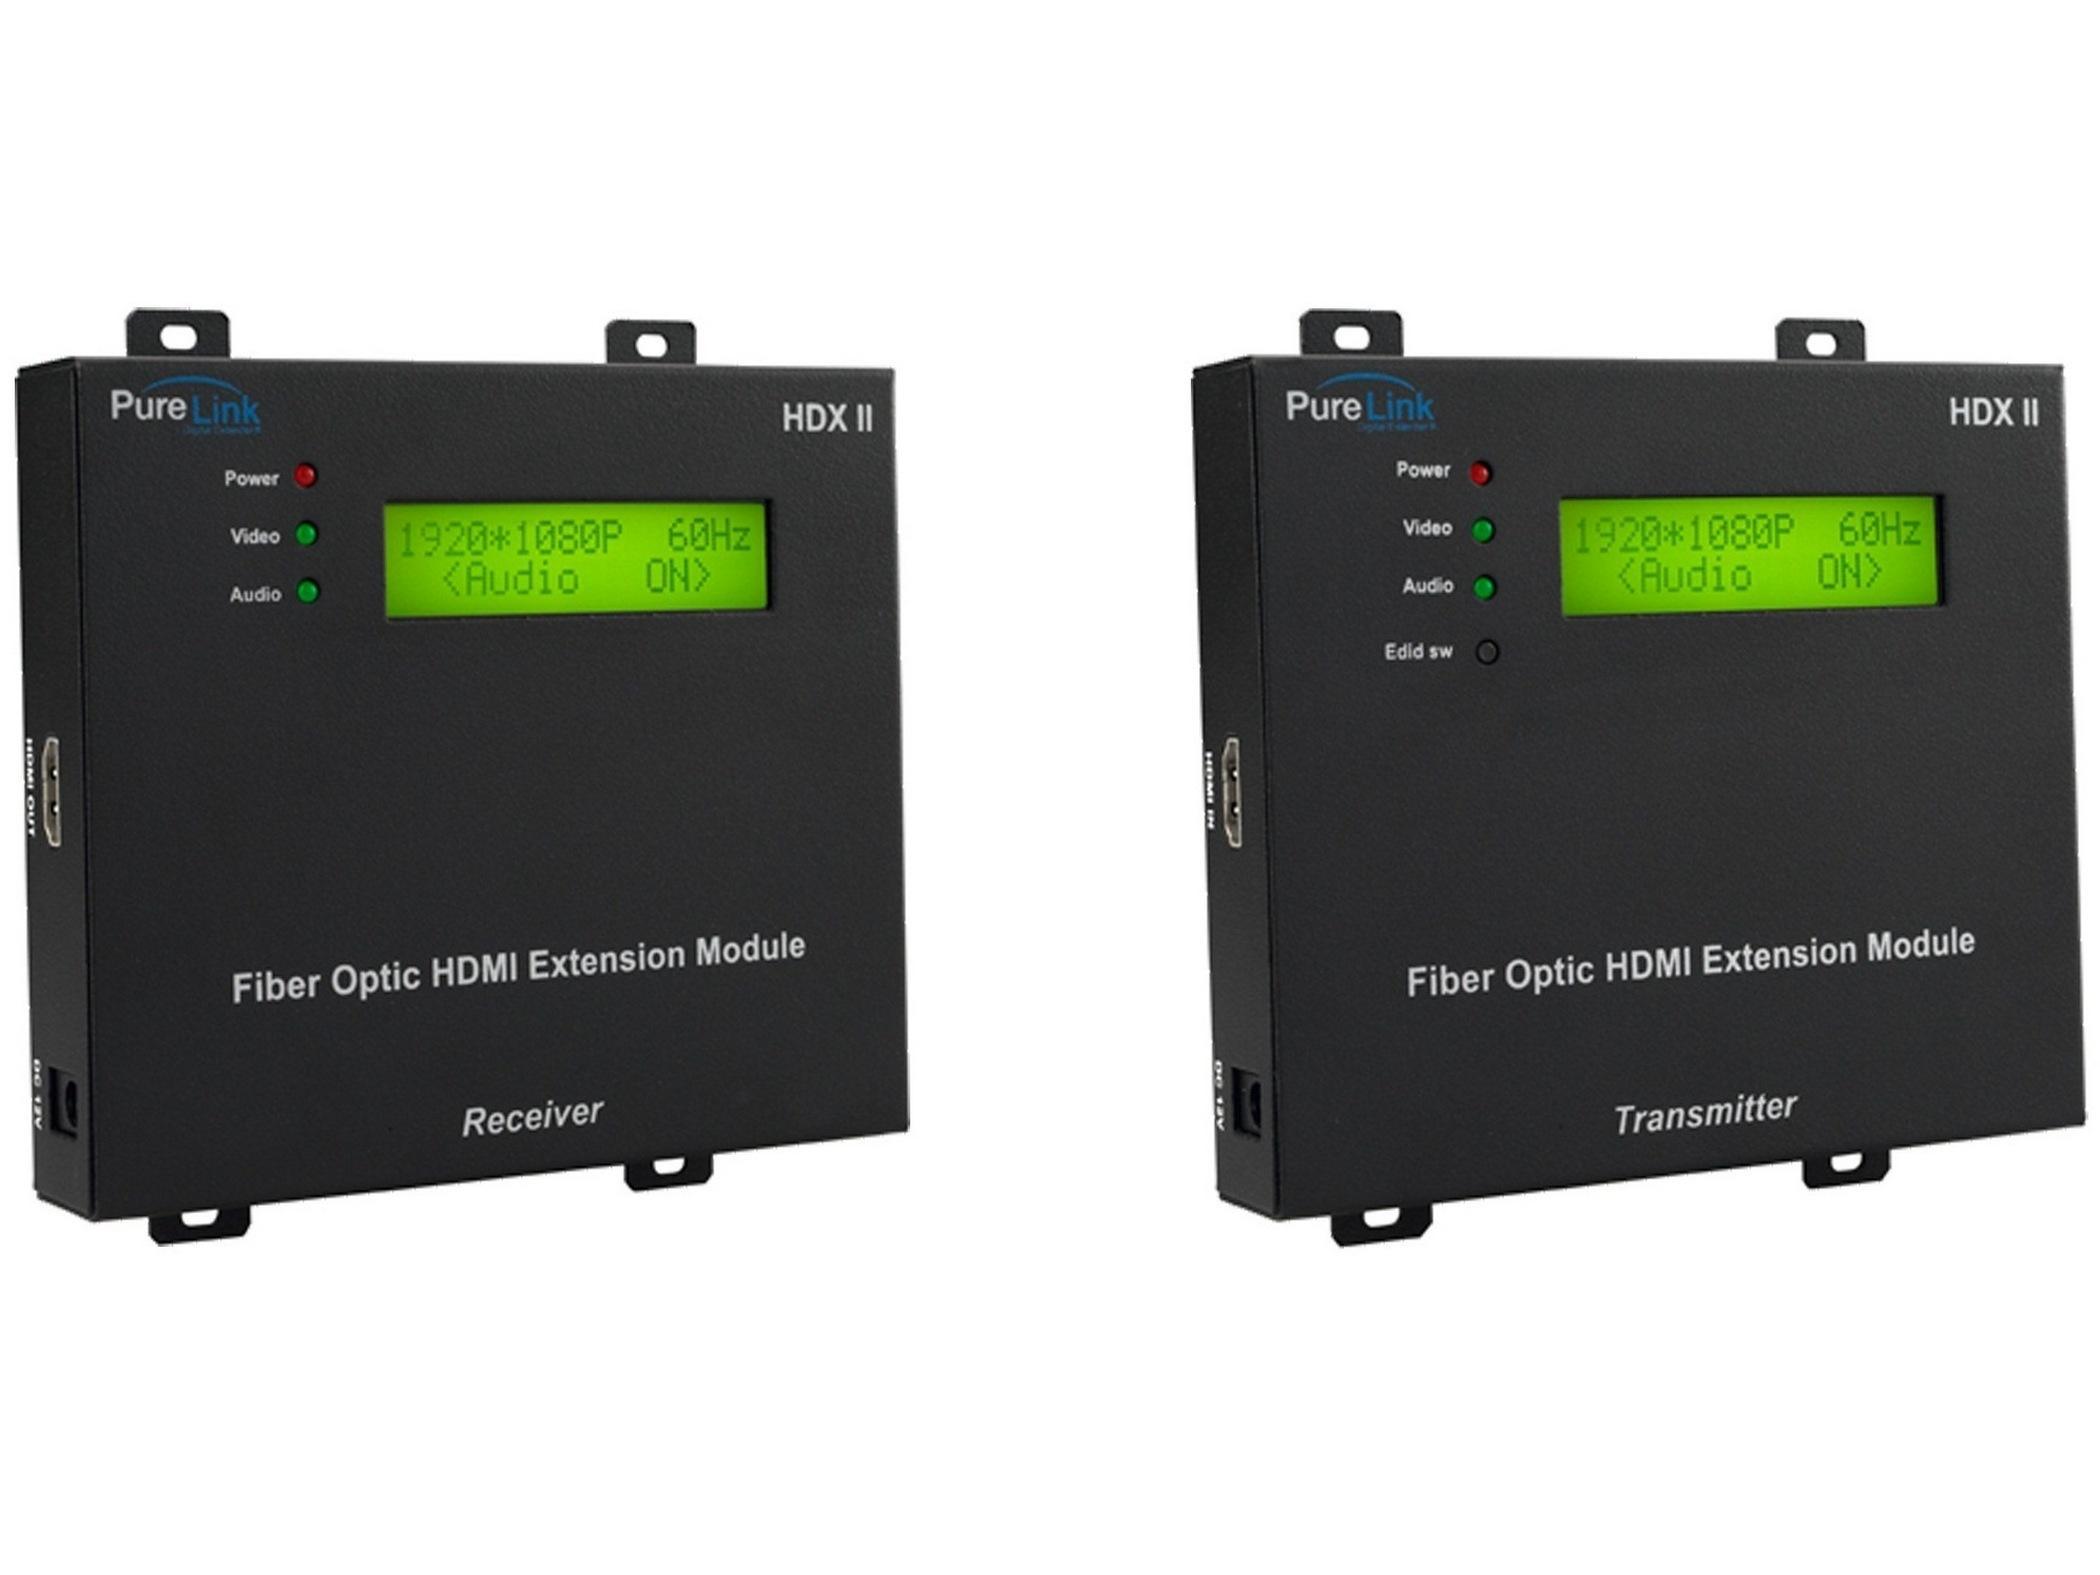 PureLink HDX II Tx/Rx HDMI over 4LC Fiber Optic Full HD Extender (Receiver/Transmitter) Kit